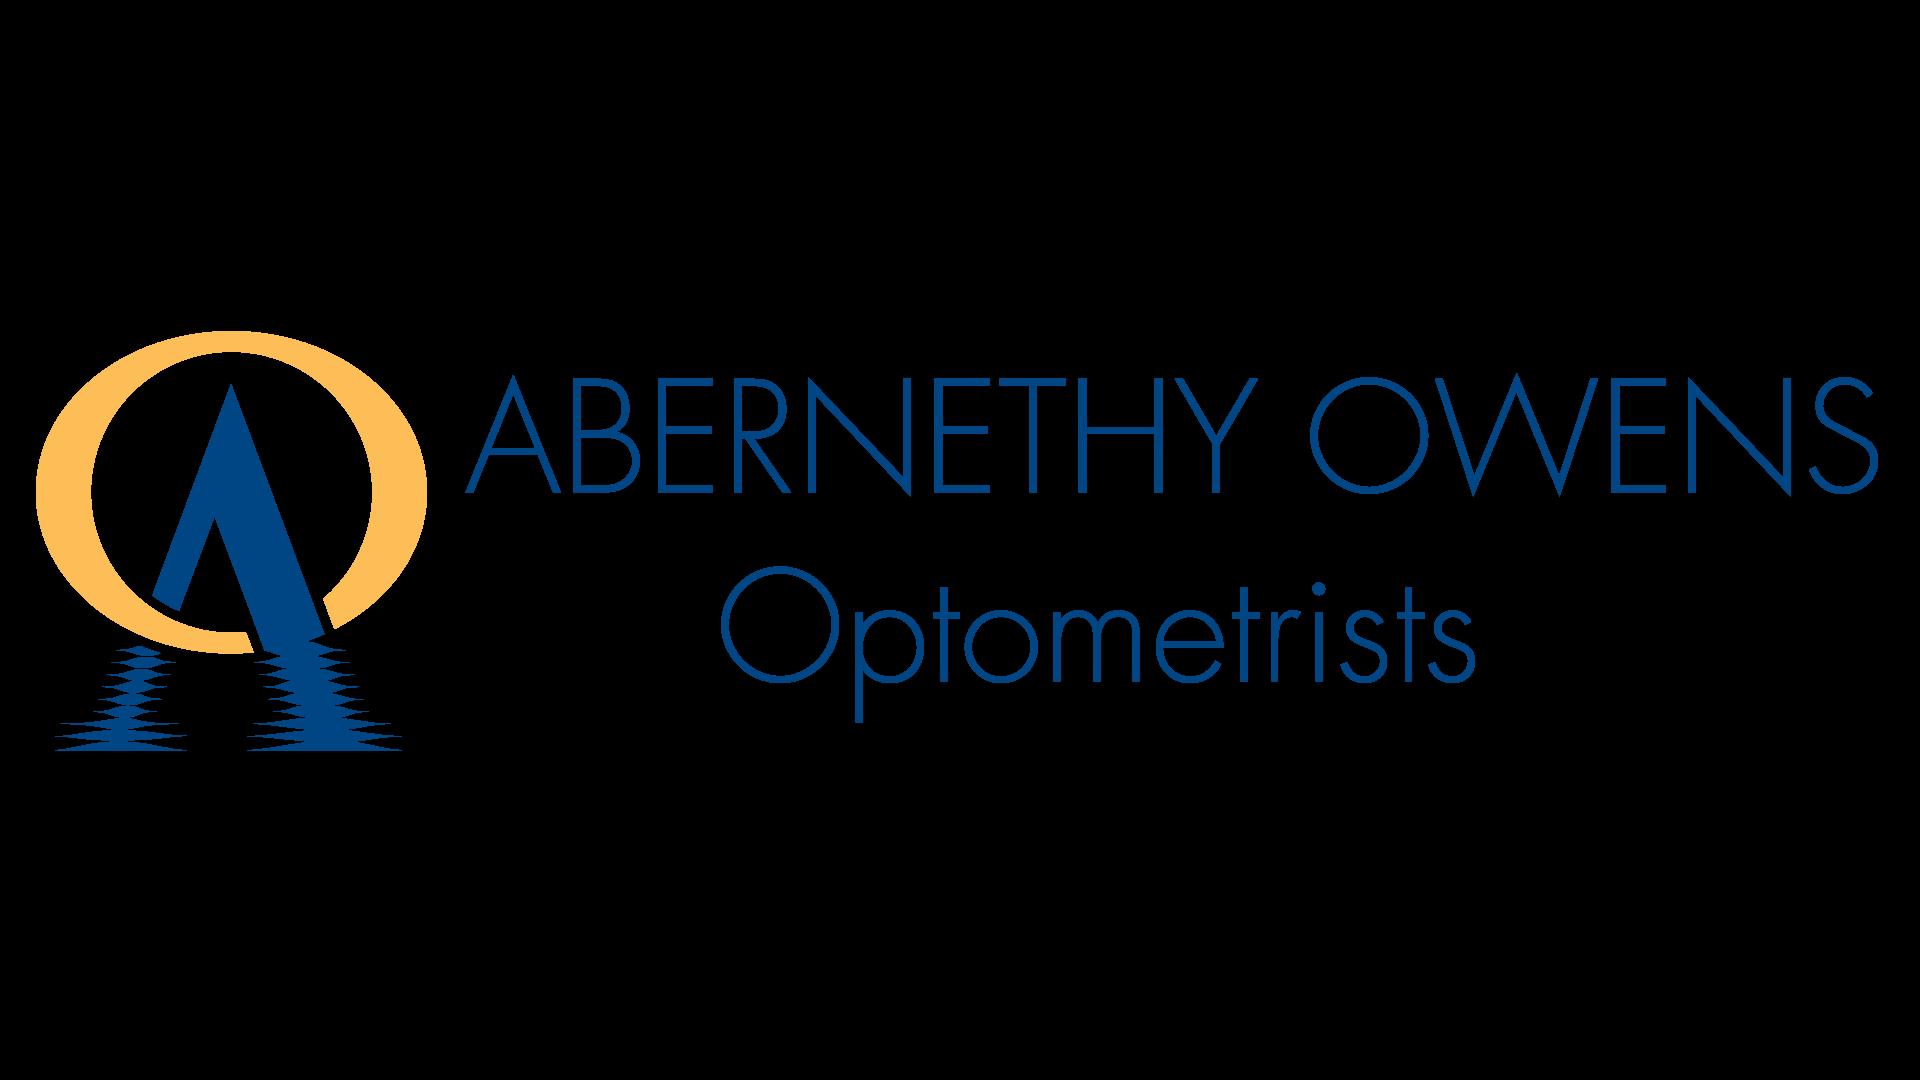 logo for Abernethy Owens Optometrists Fremantle Optometrists